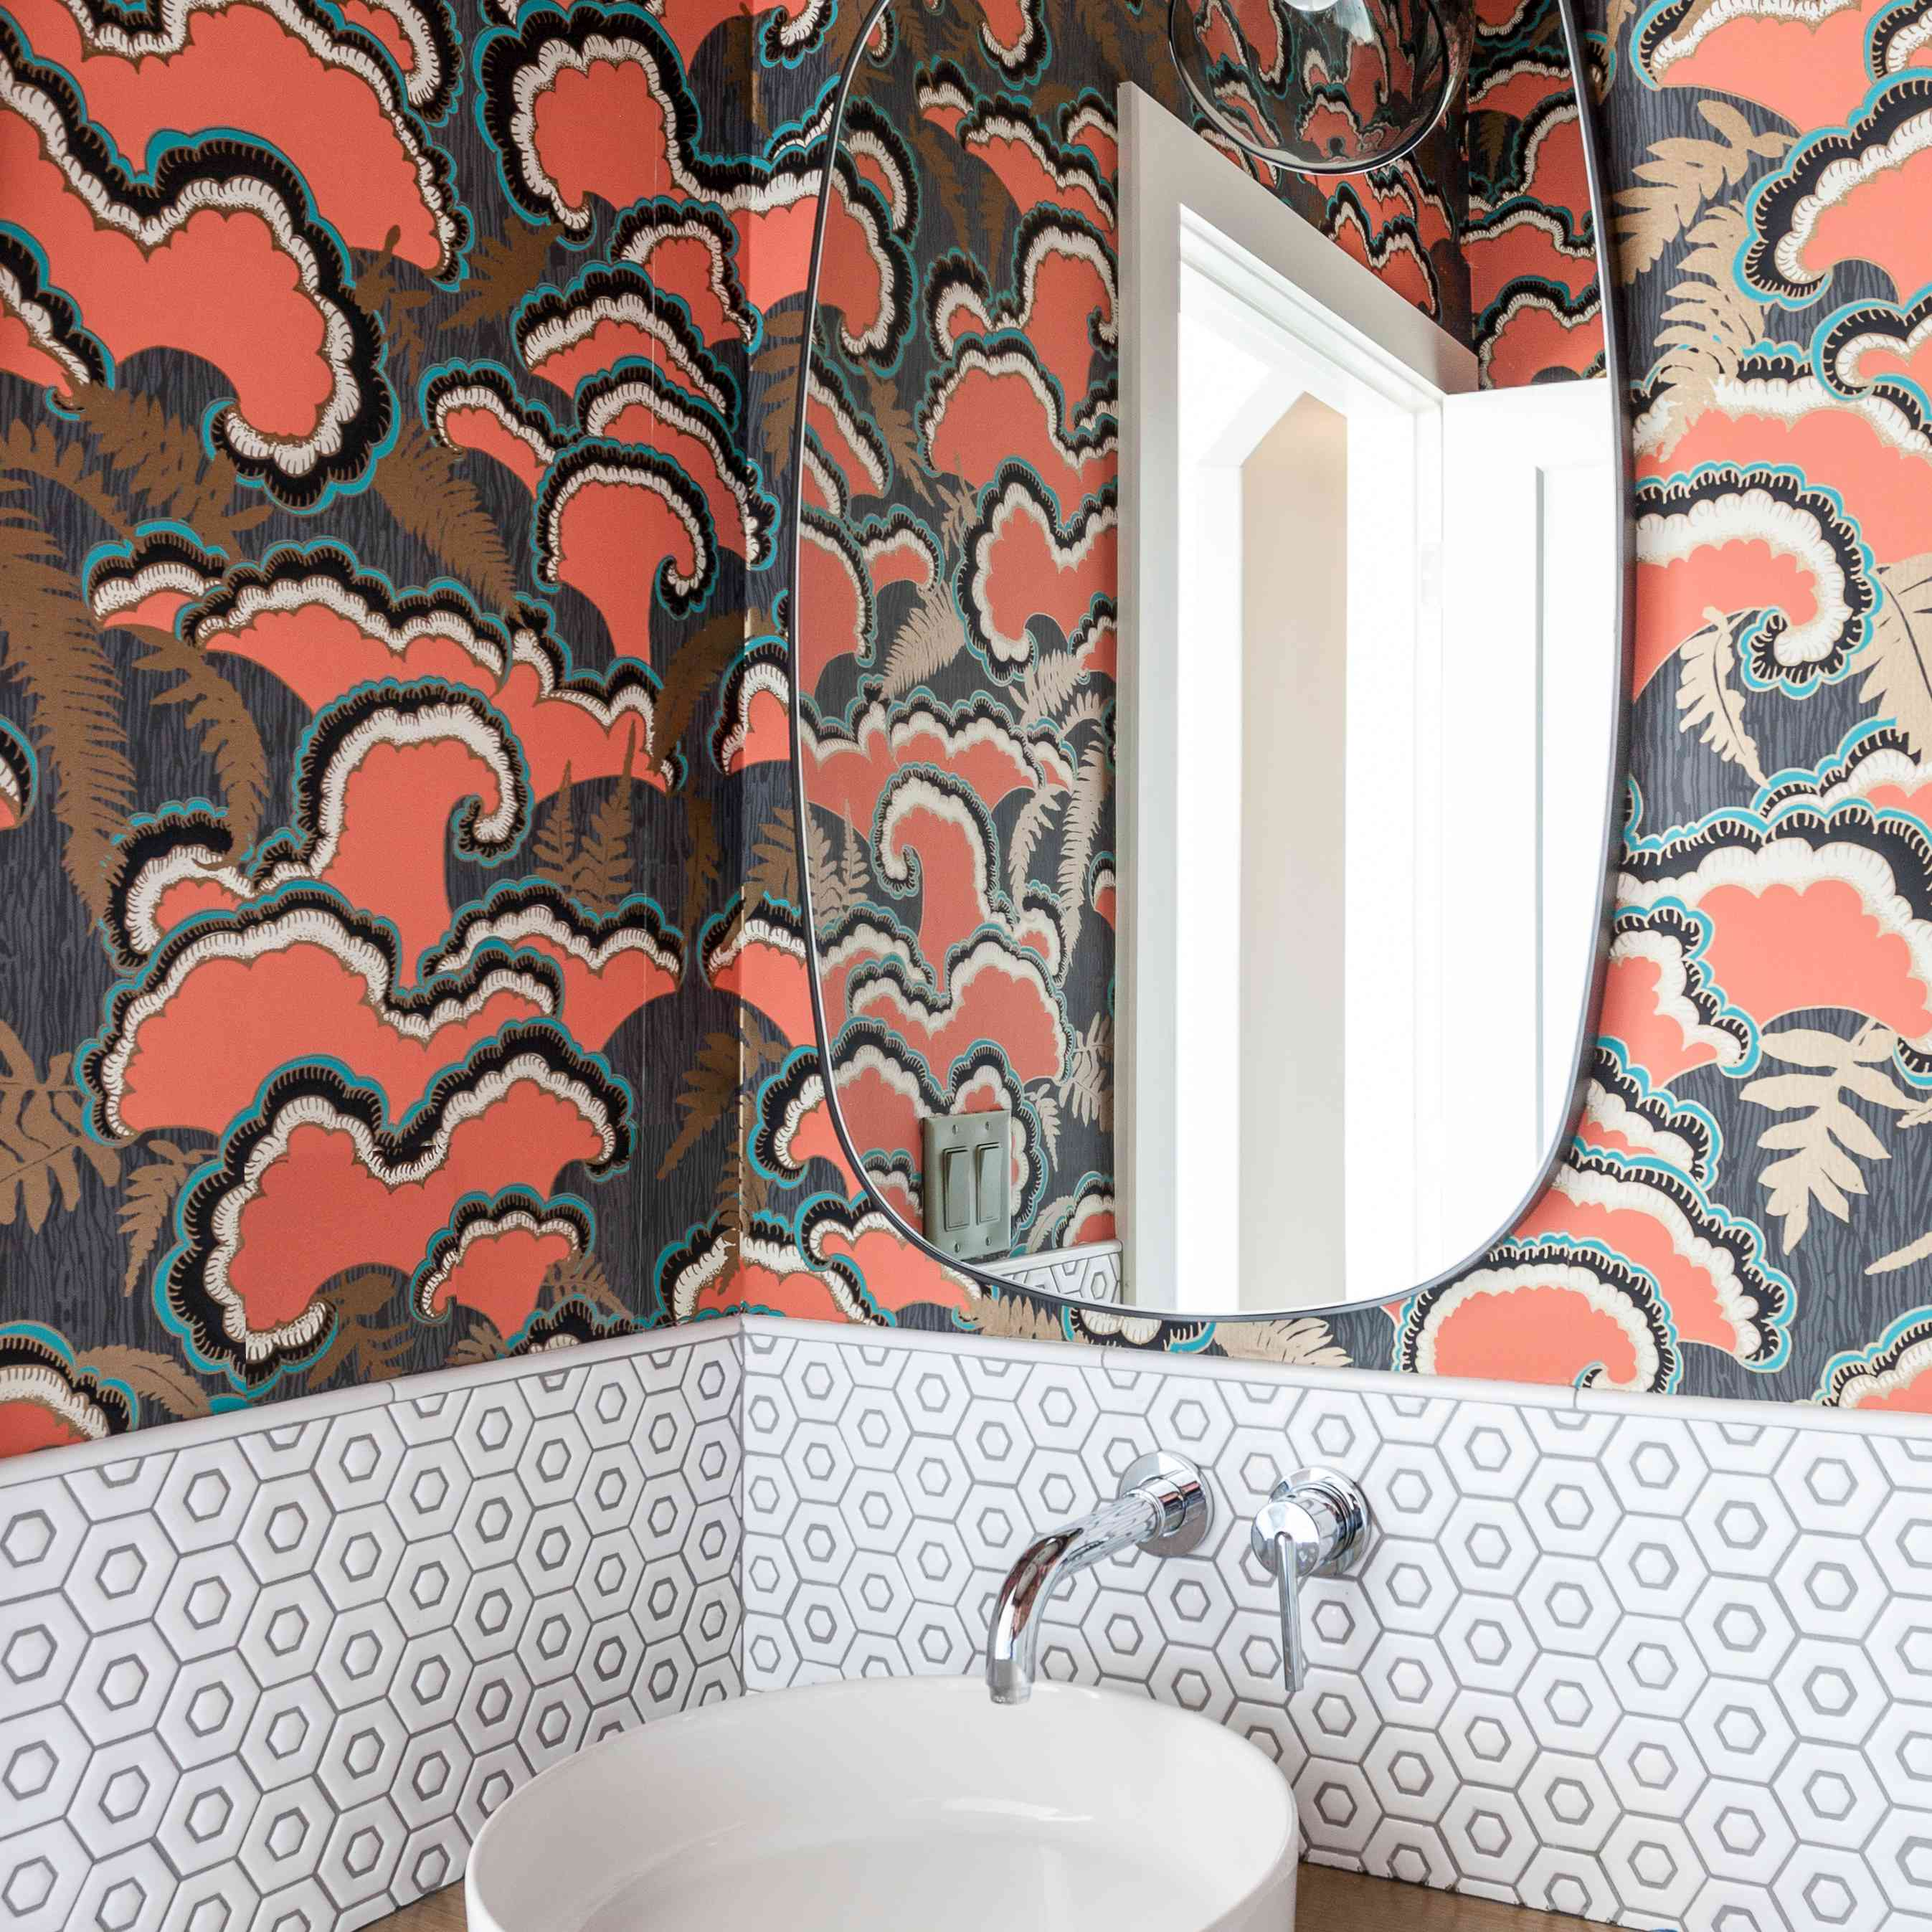 Groovy powder room wallpaper